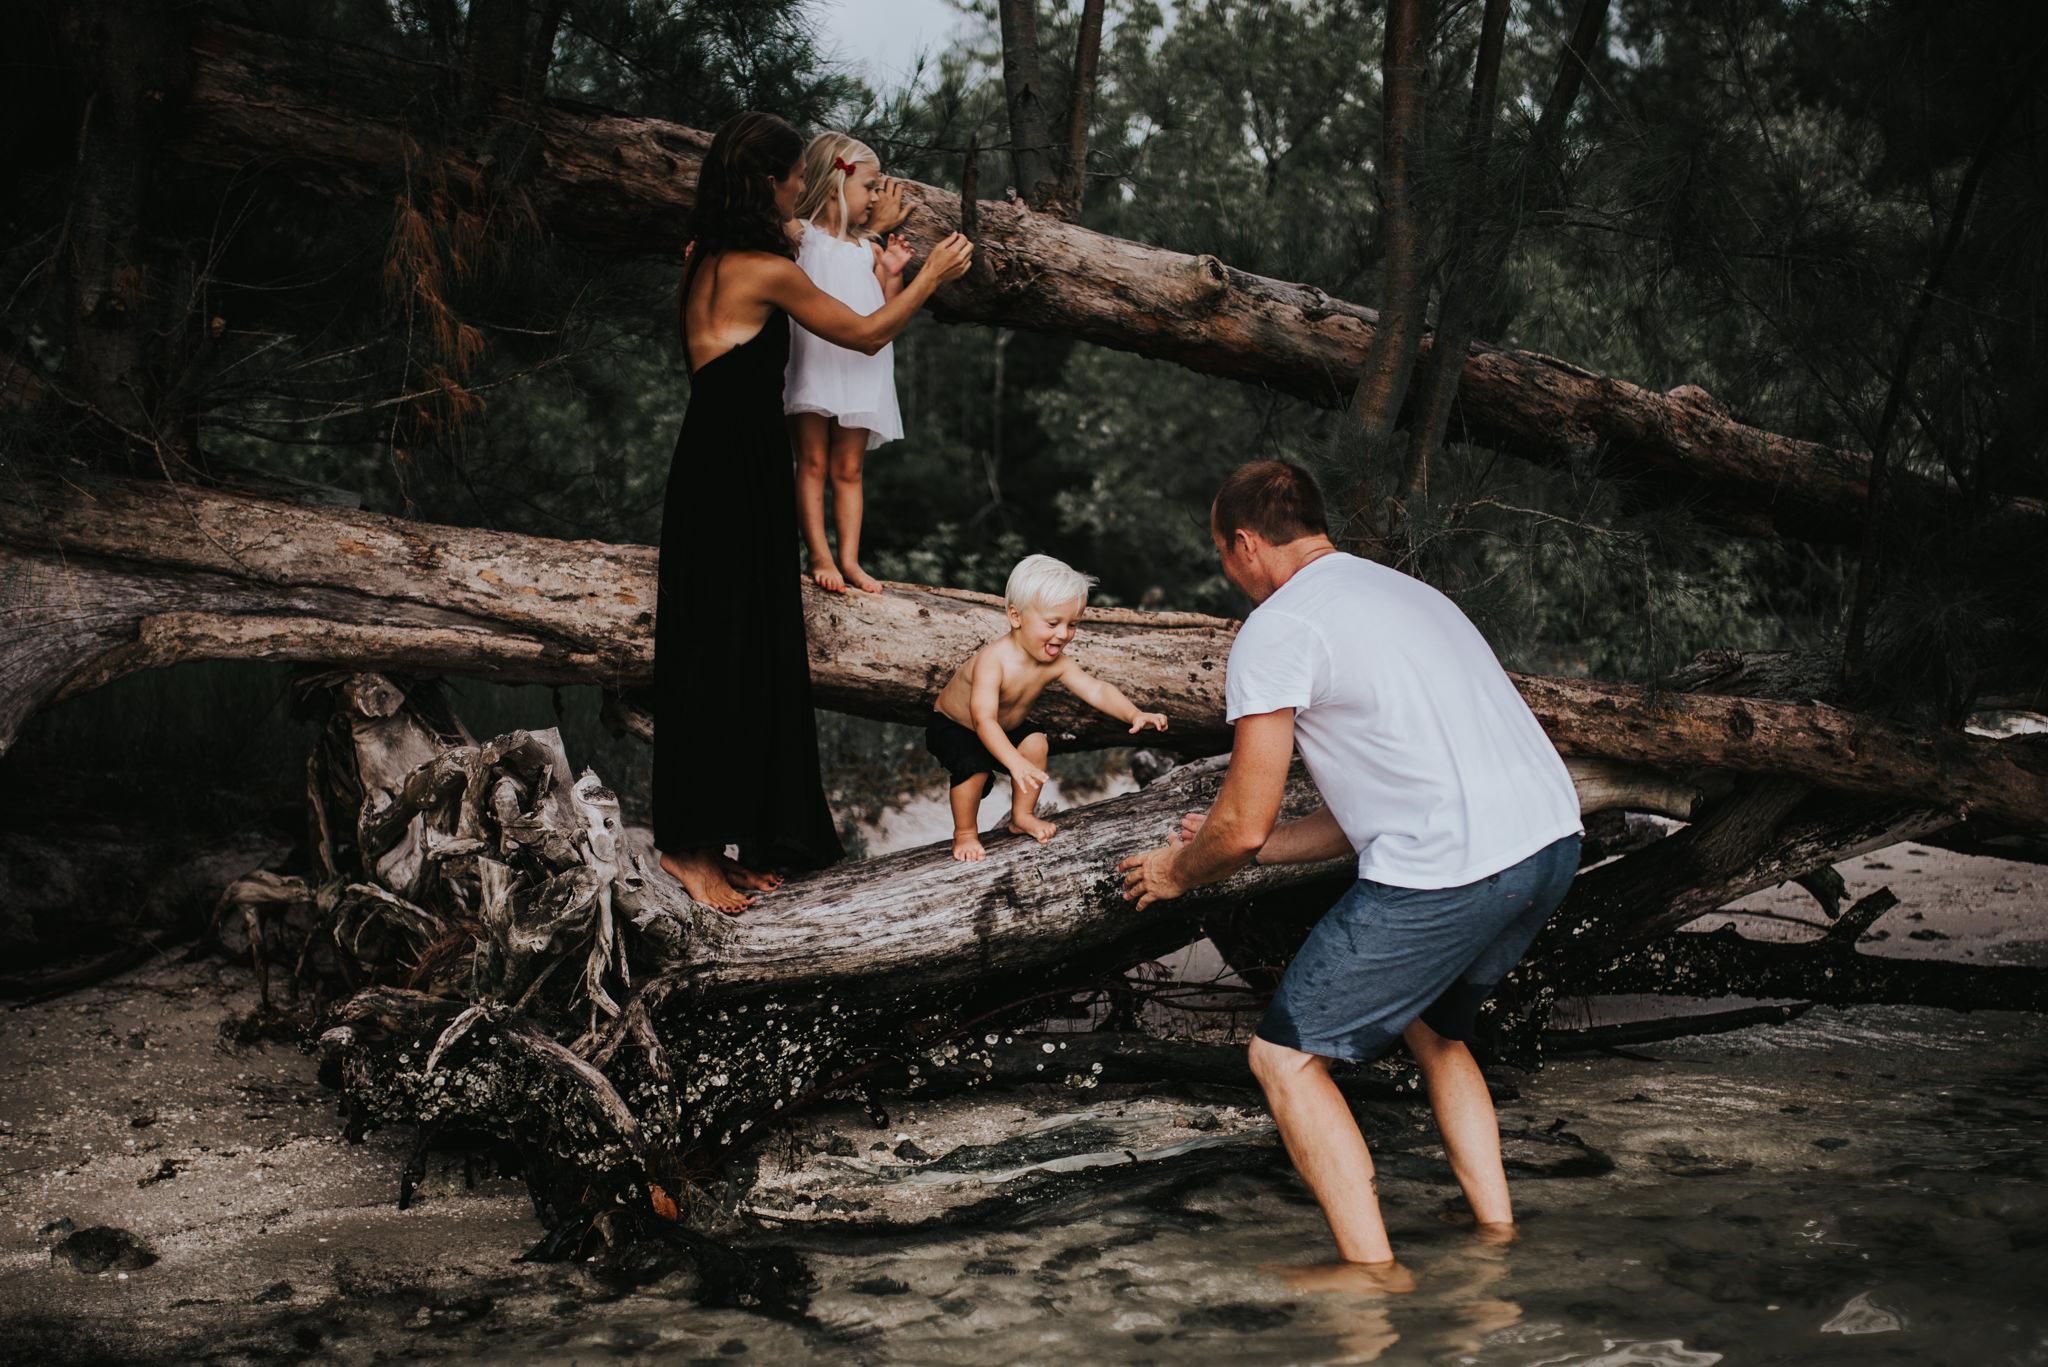 twyla jones photography - treasure coast florida - island family session-4818.jpg